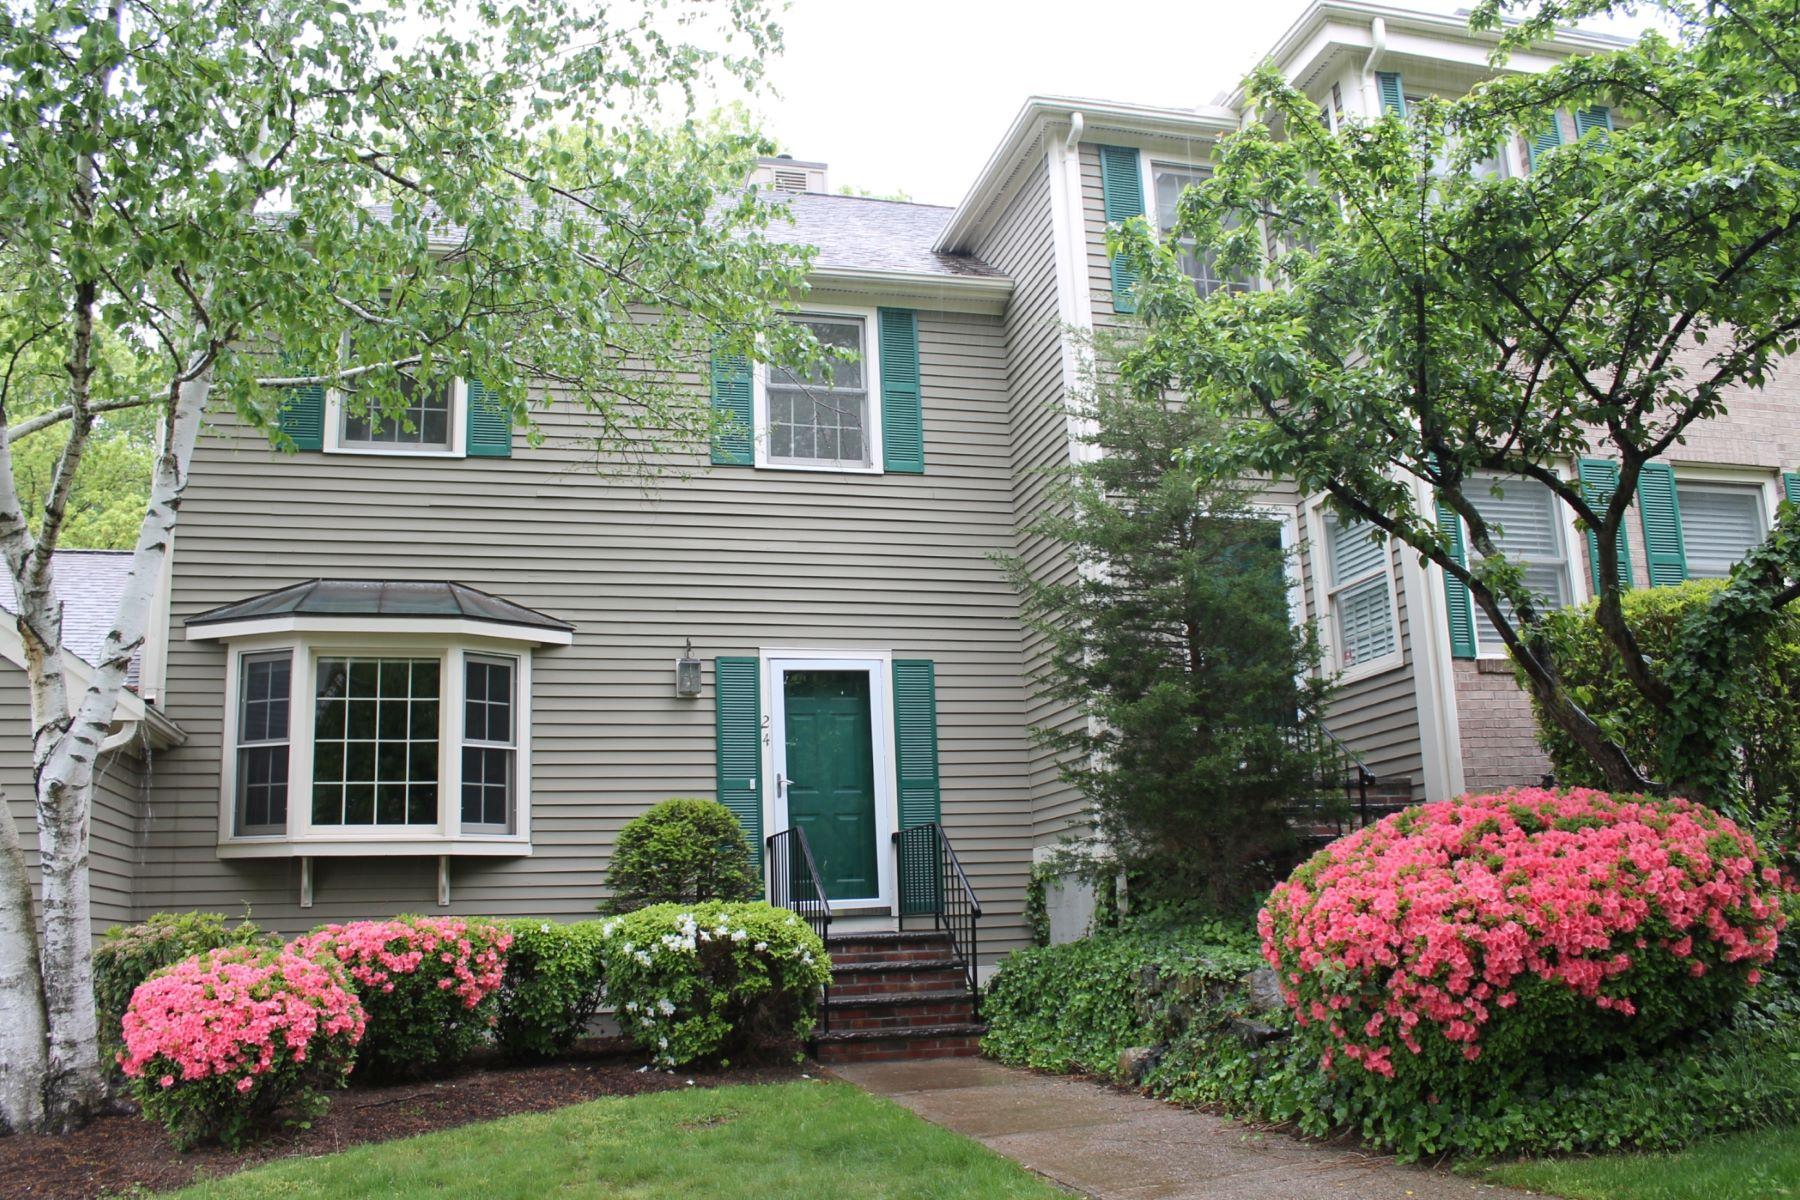 Condominio por un Venta en The Village at Clarks Pond 501 Lexington Street Unit 24 Waltham, Massachusetts 02452 Estados Unidos